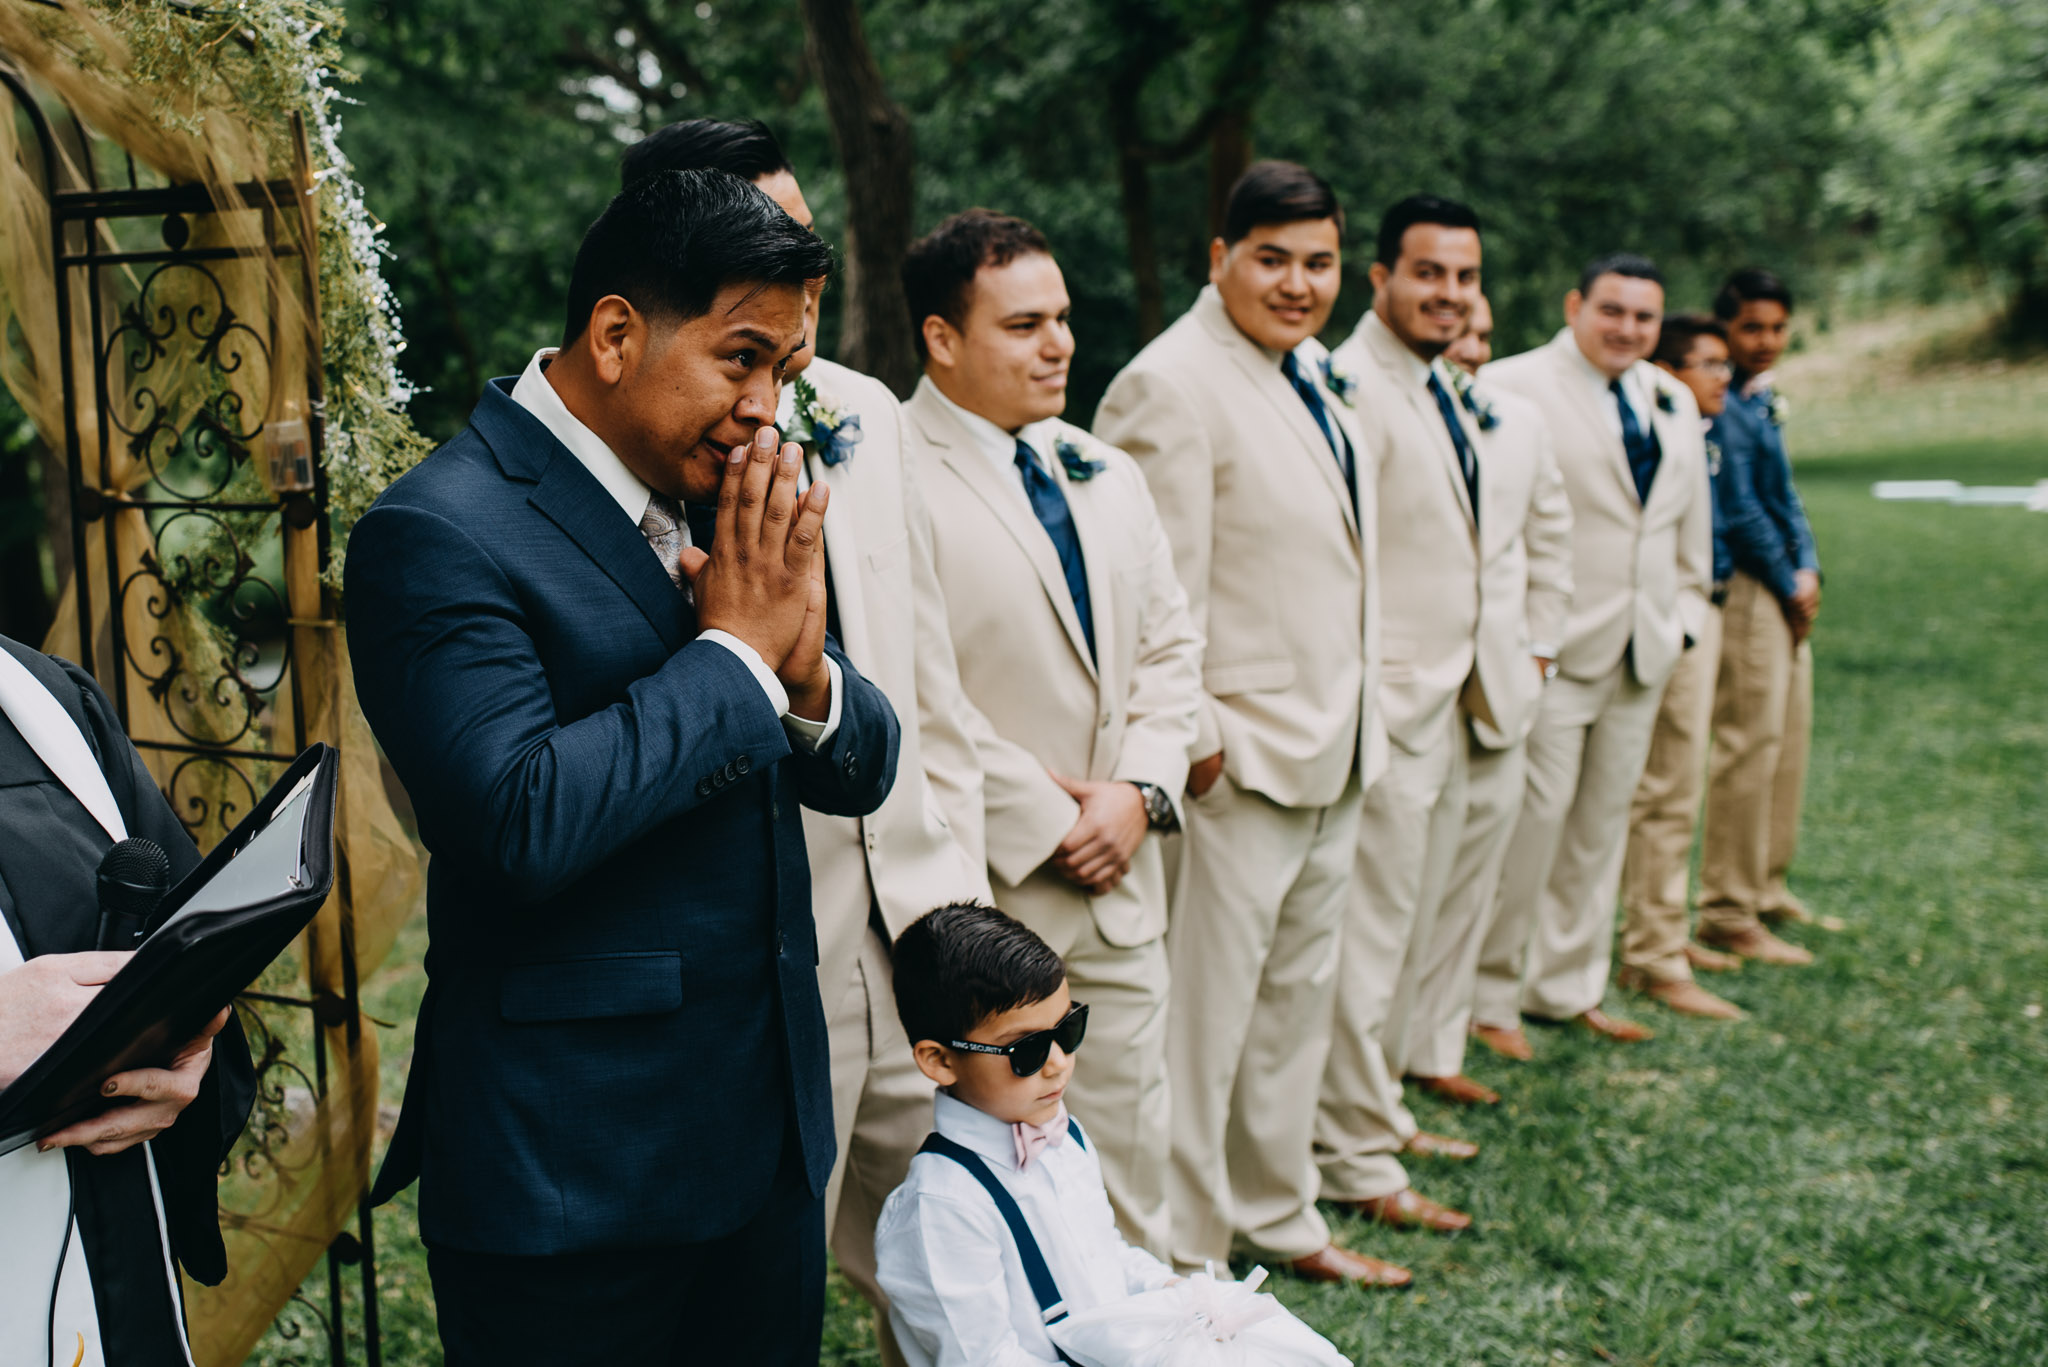 Antonio seeing his bride Megan - Christoval, Texas